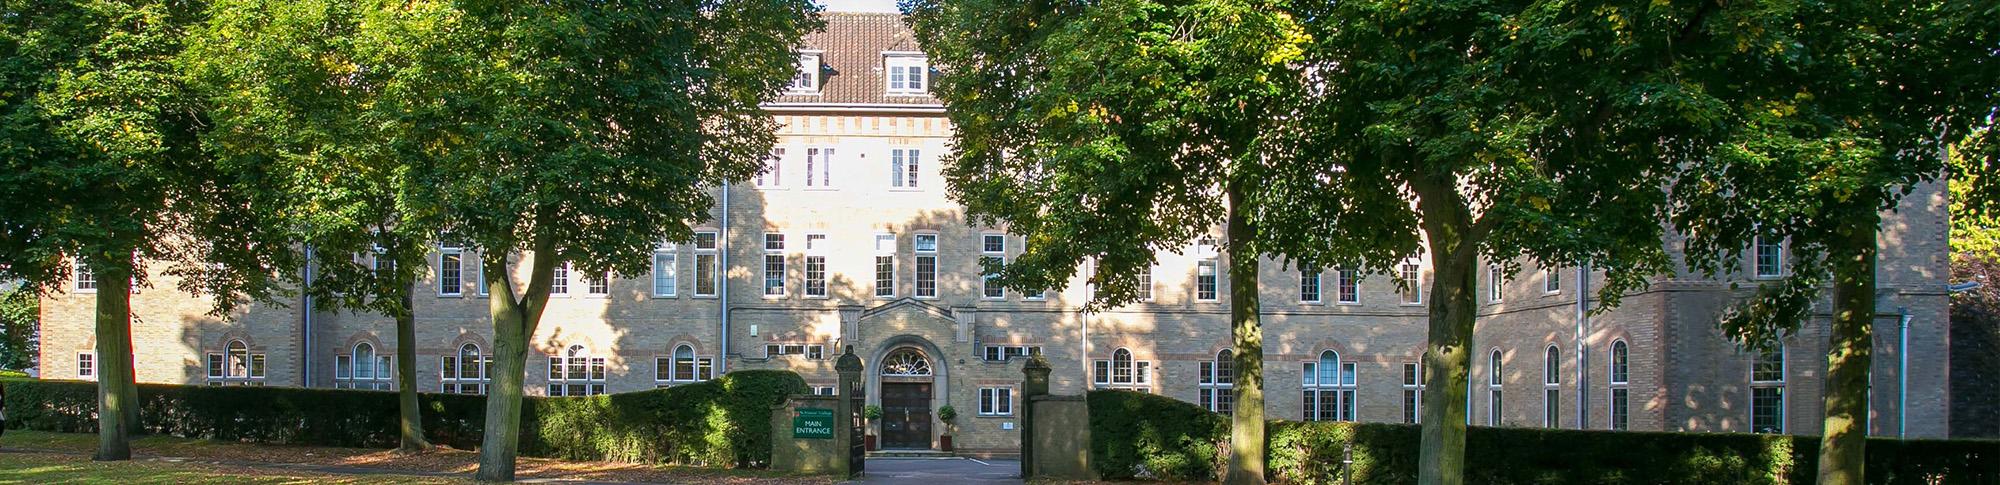 UK-Boarding-Schools-St-Francis-College-Header